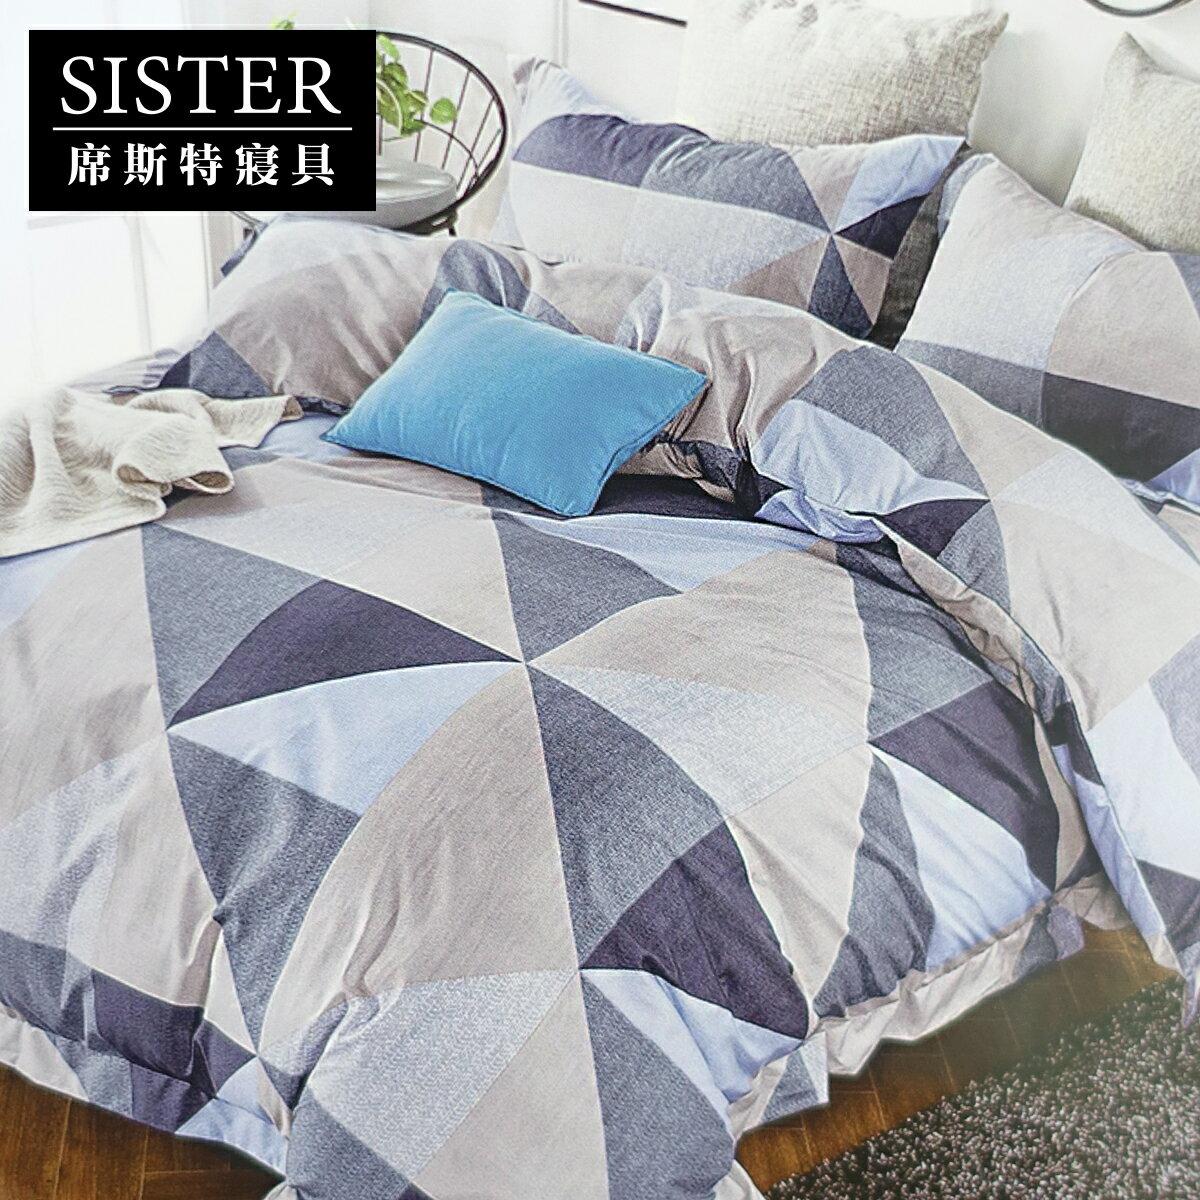 【SISTER席斯特】北歐幾何 床包枕套三件組-雙人